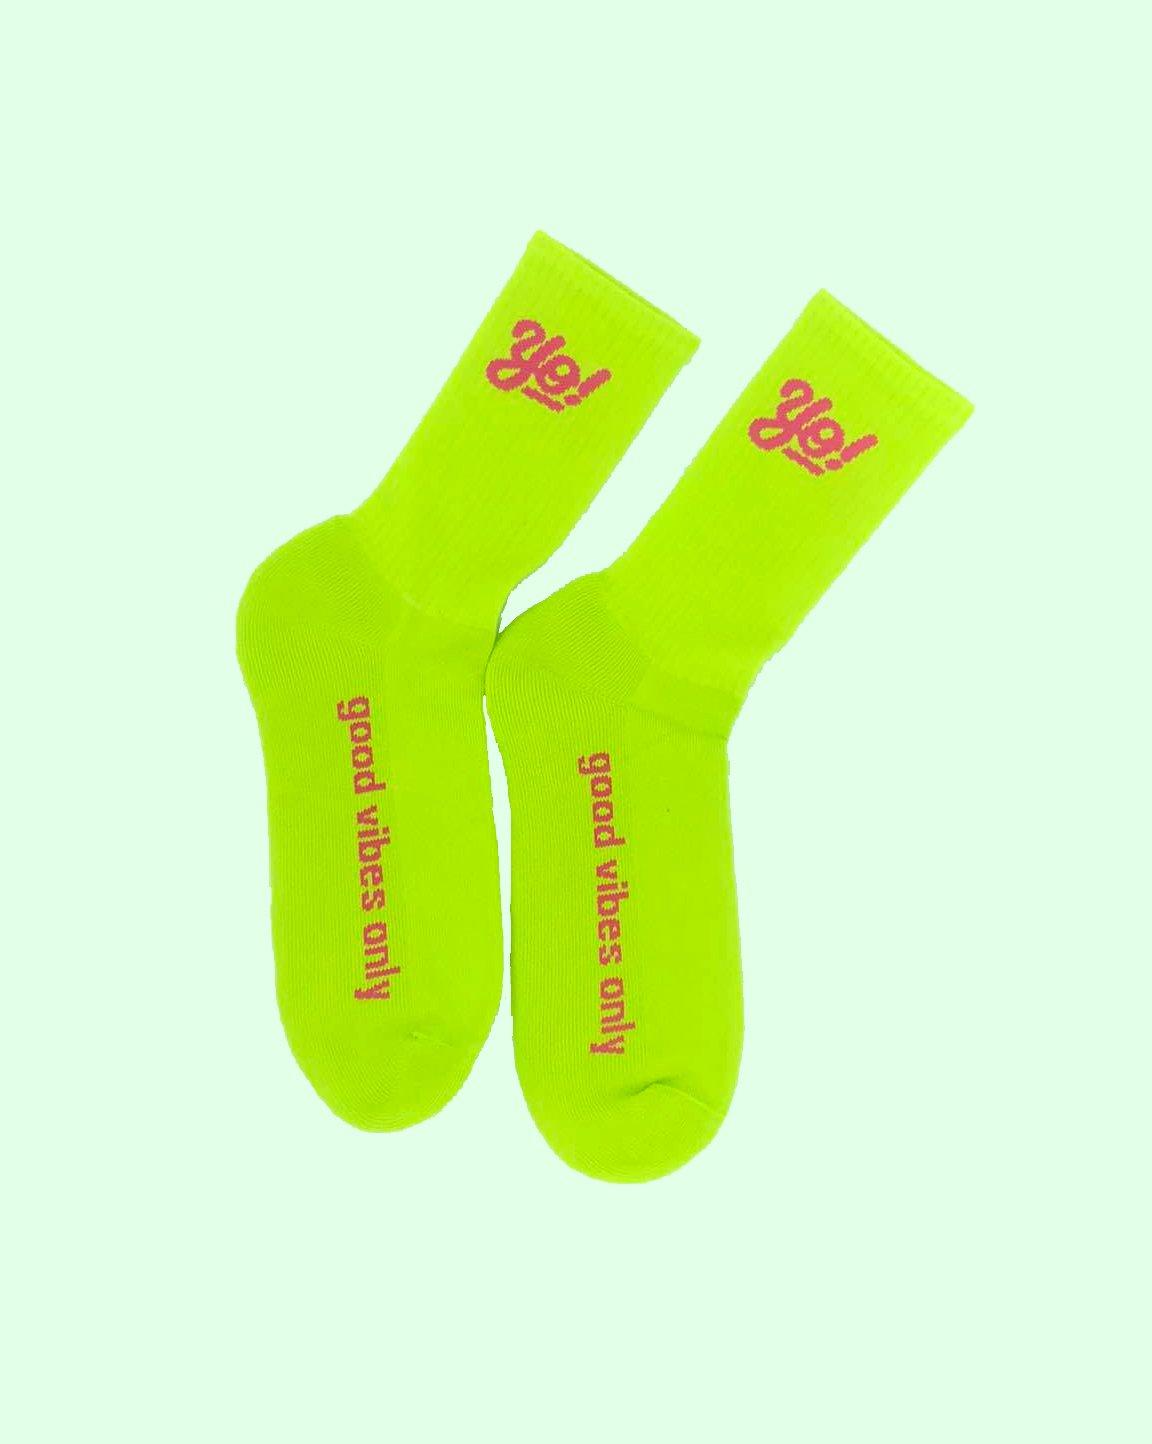 Image of good socks